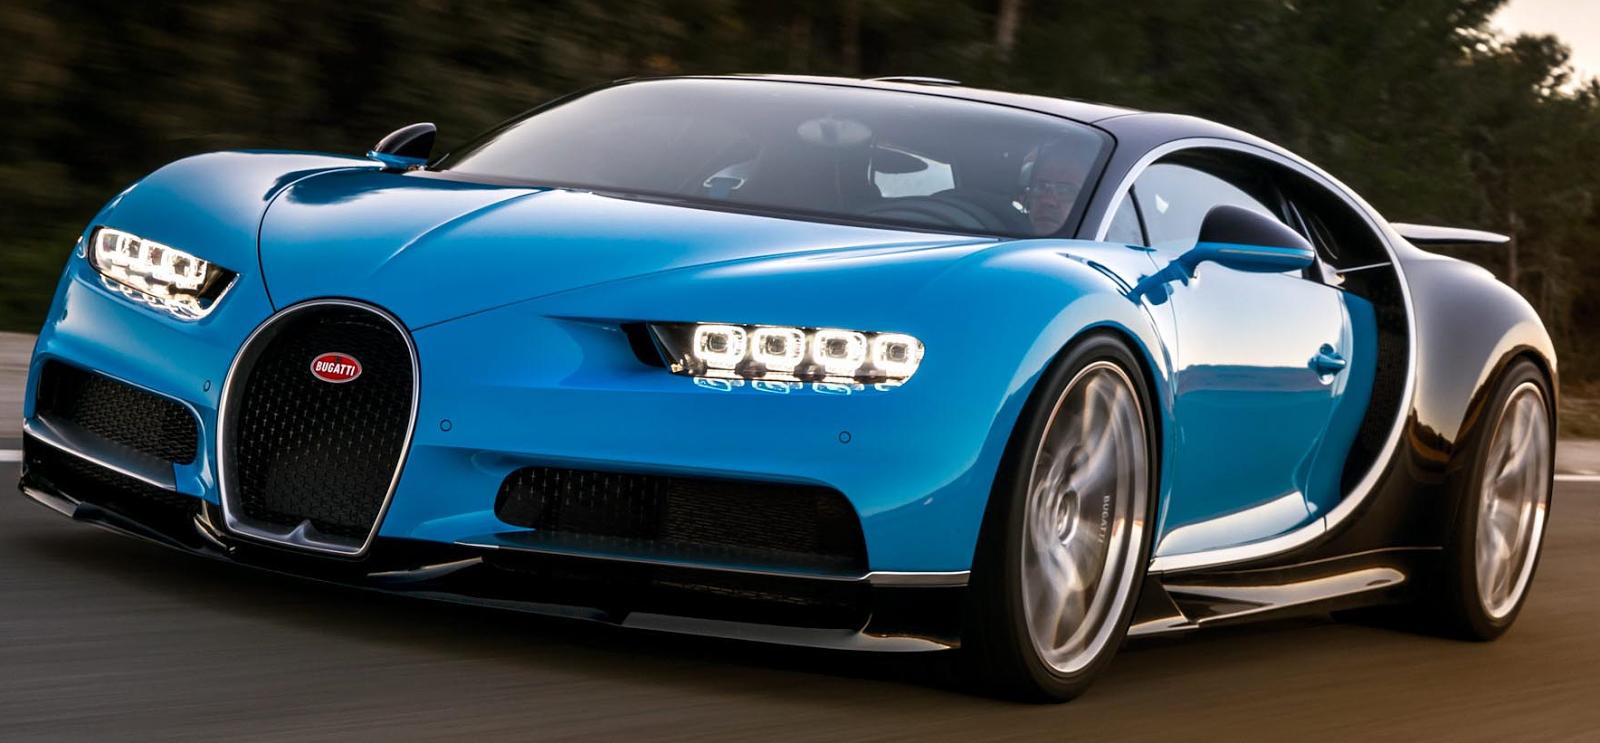 Canada Stock Journal: Bugatti Chiron - World\'s Fastest Production Car